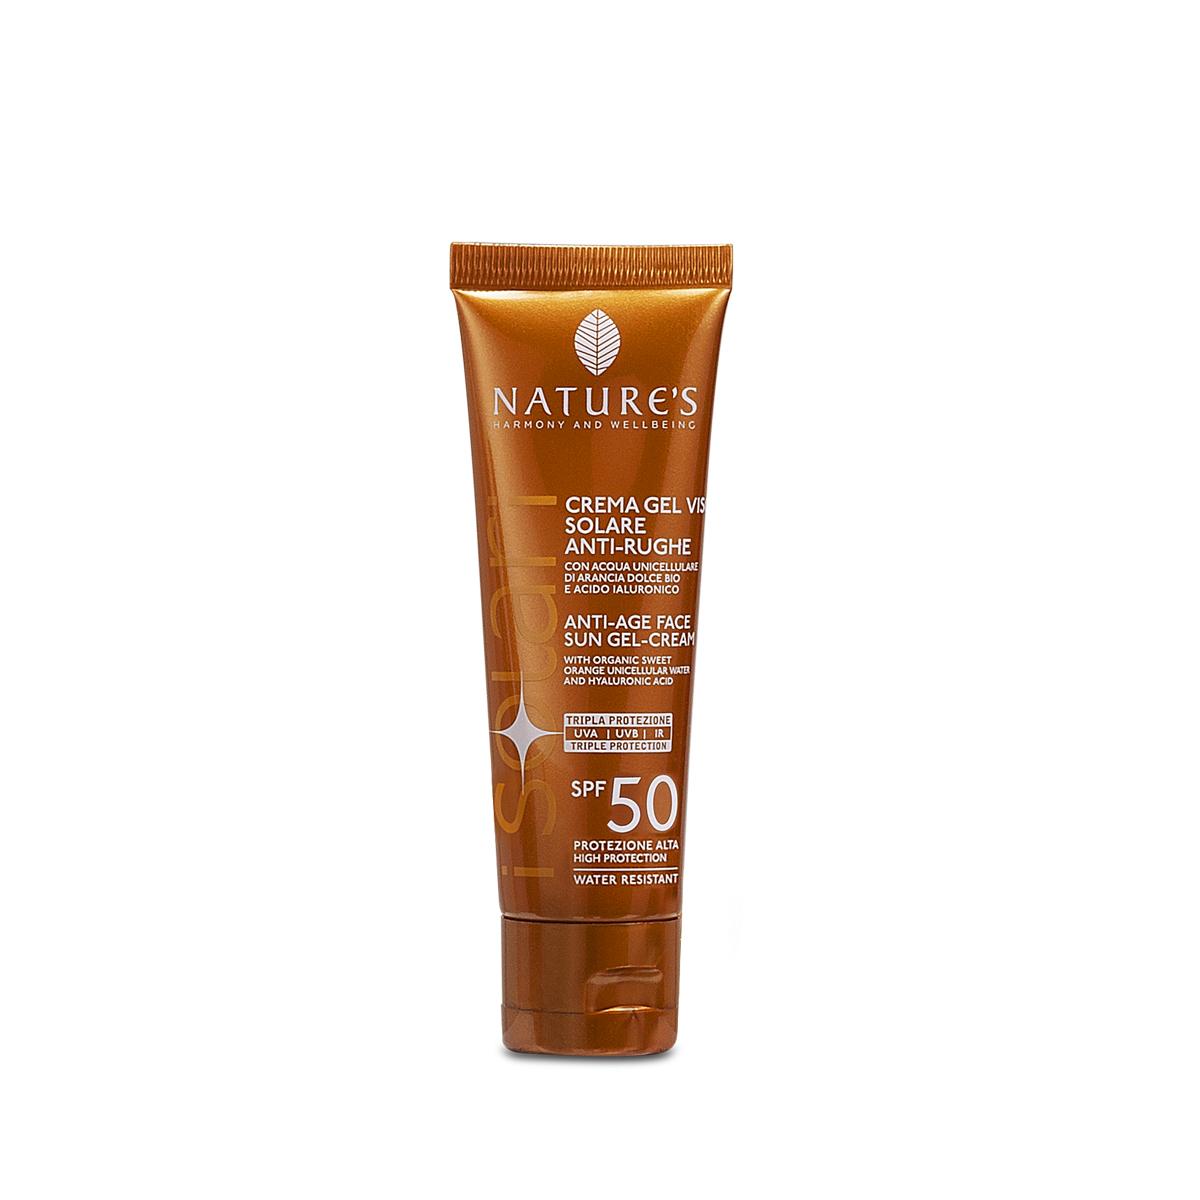 Crema-gel viso Solare Antirughe SPF50